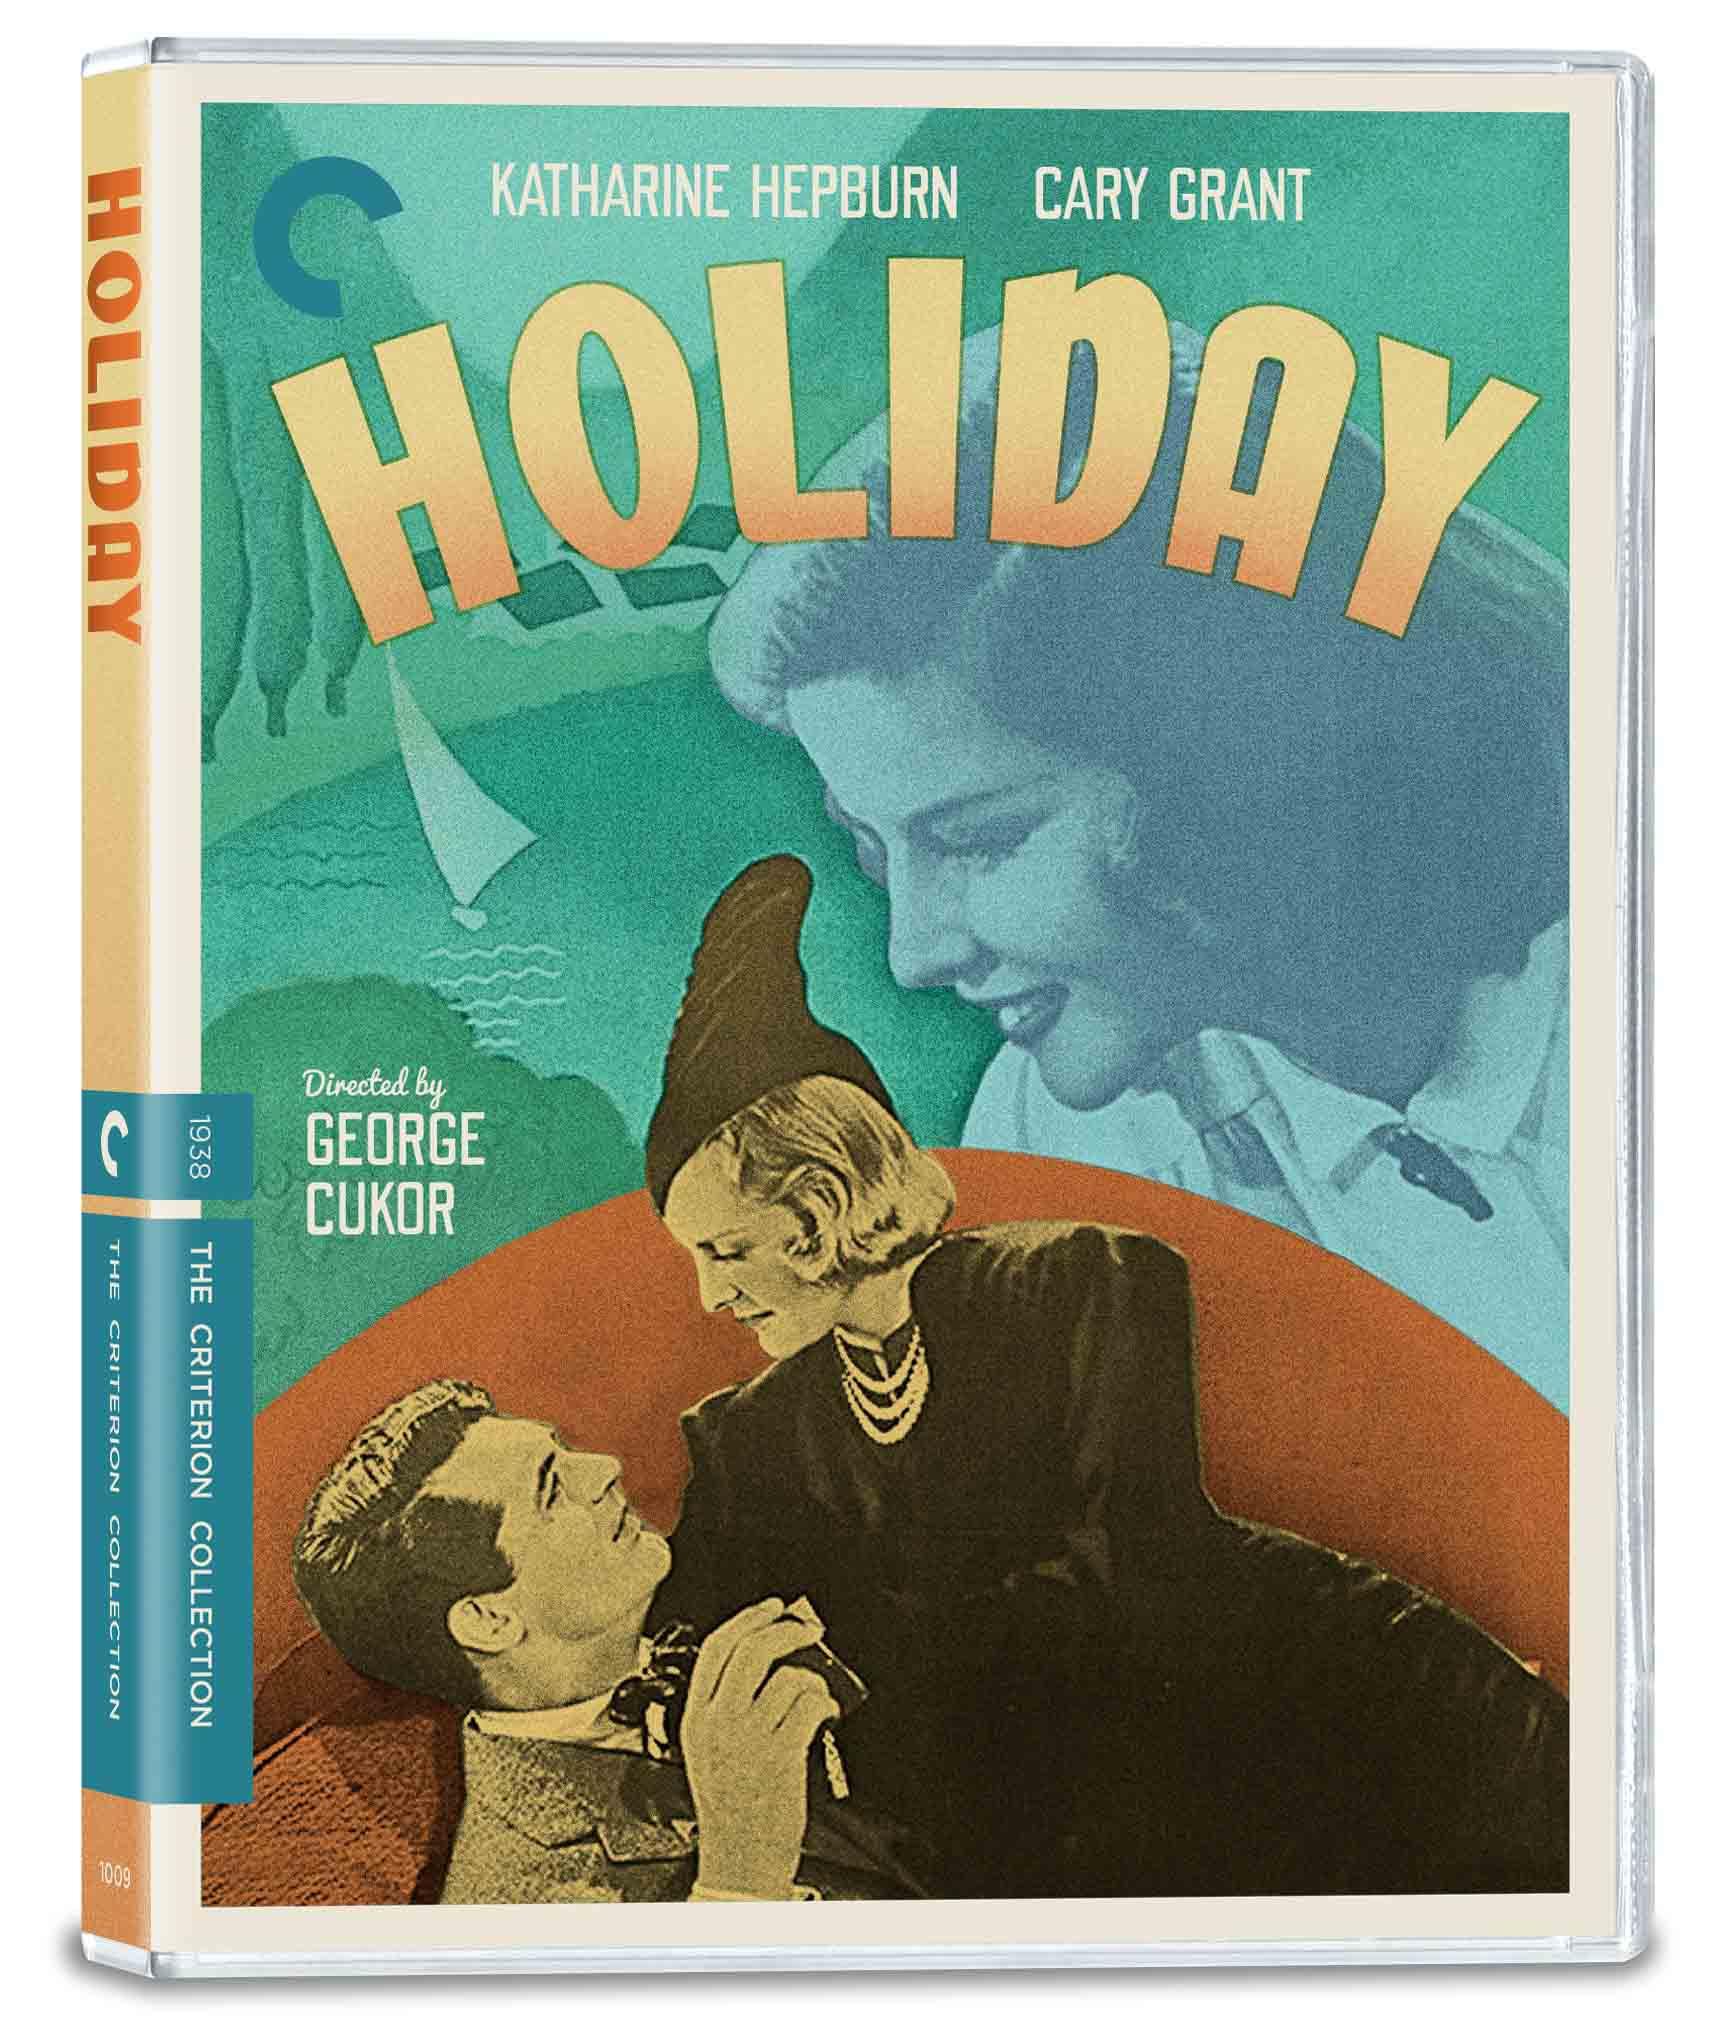 Buy PRE-ORDER Holiday (Blu-ray)